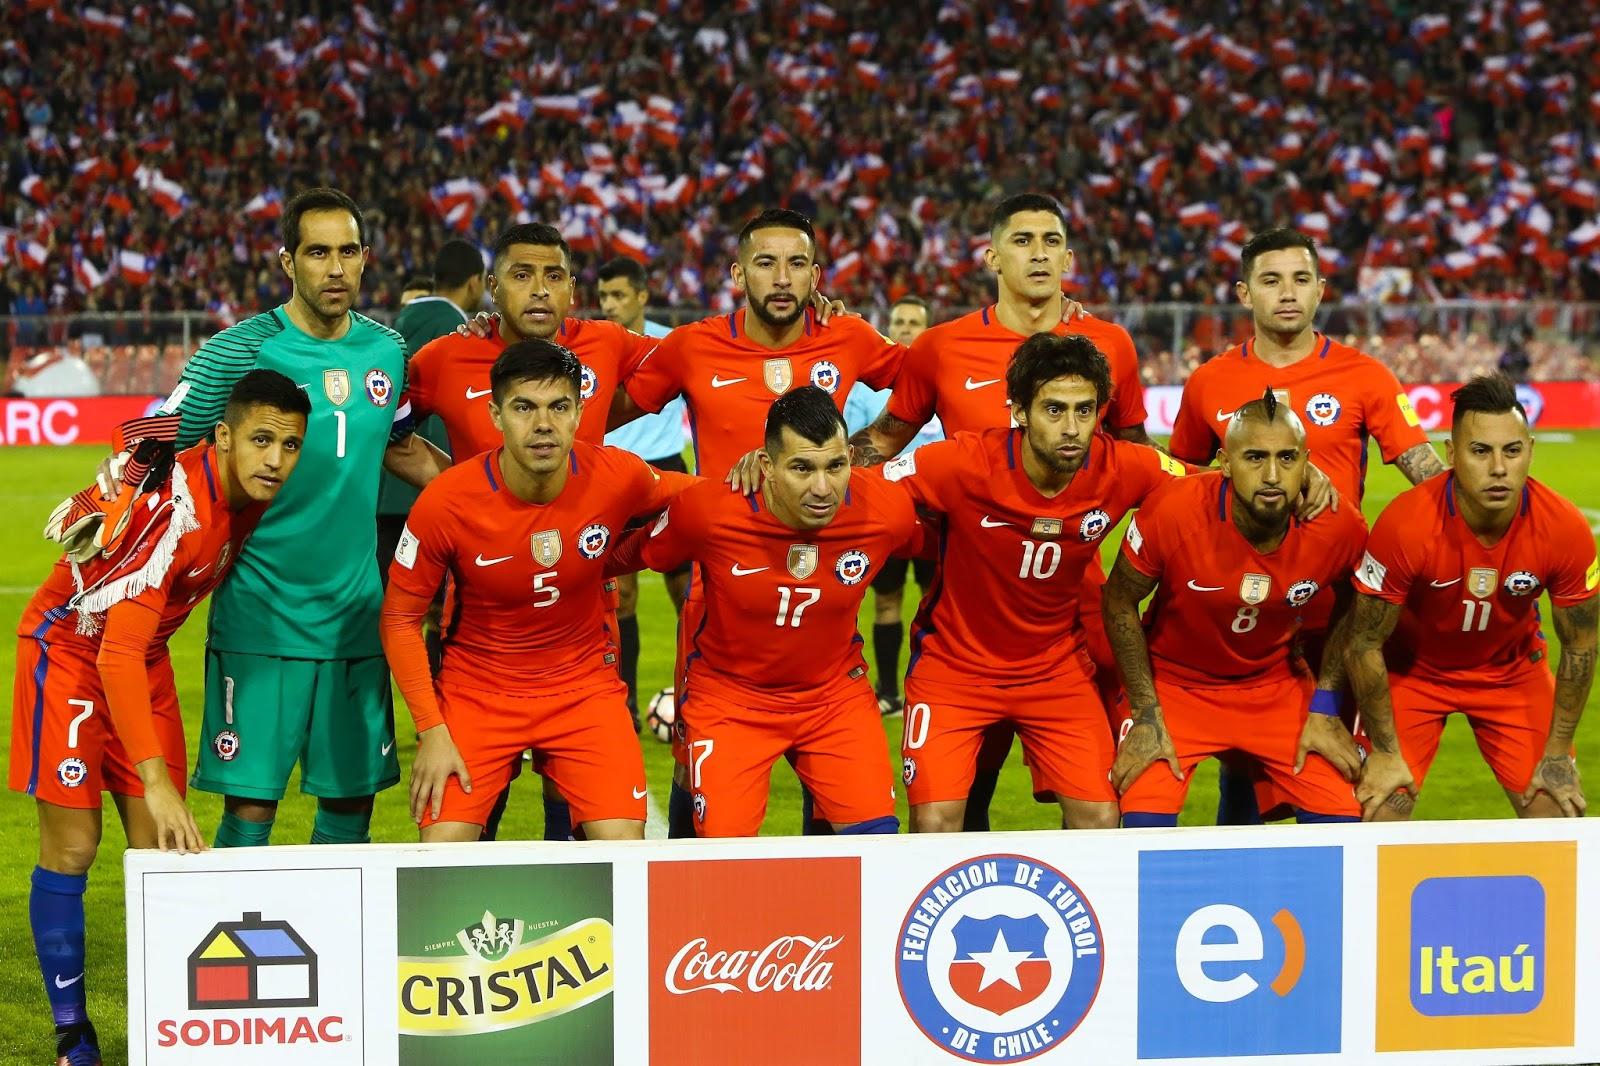 Formación de Chile ante Ecuador, Clasificatorias Rusia 2018, 5 de octubre de 2017